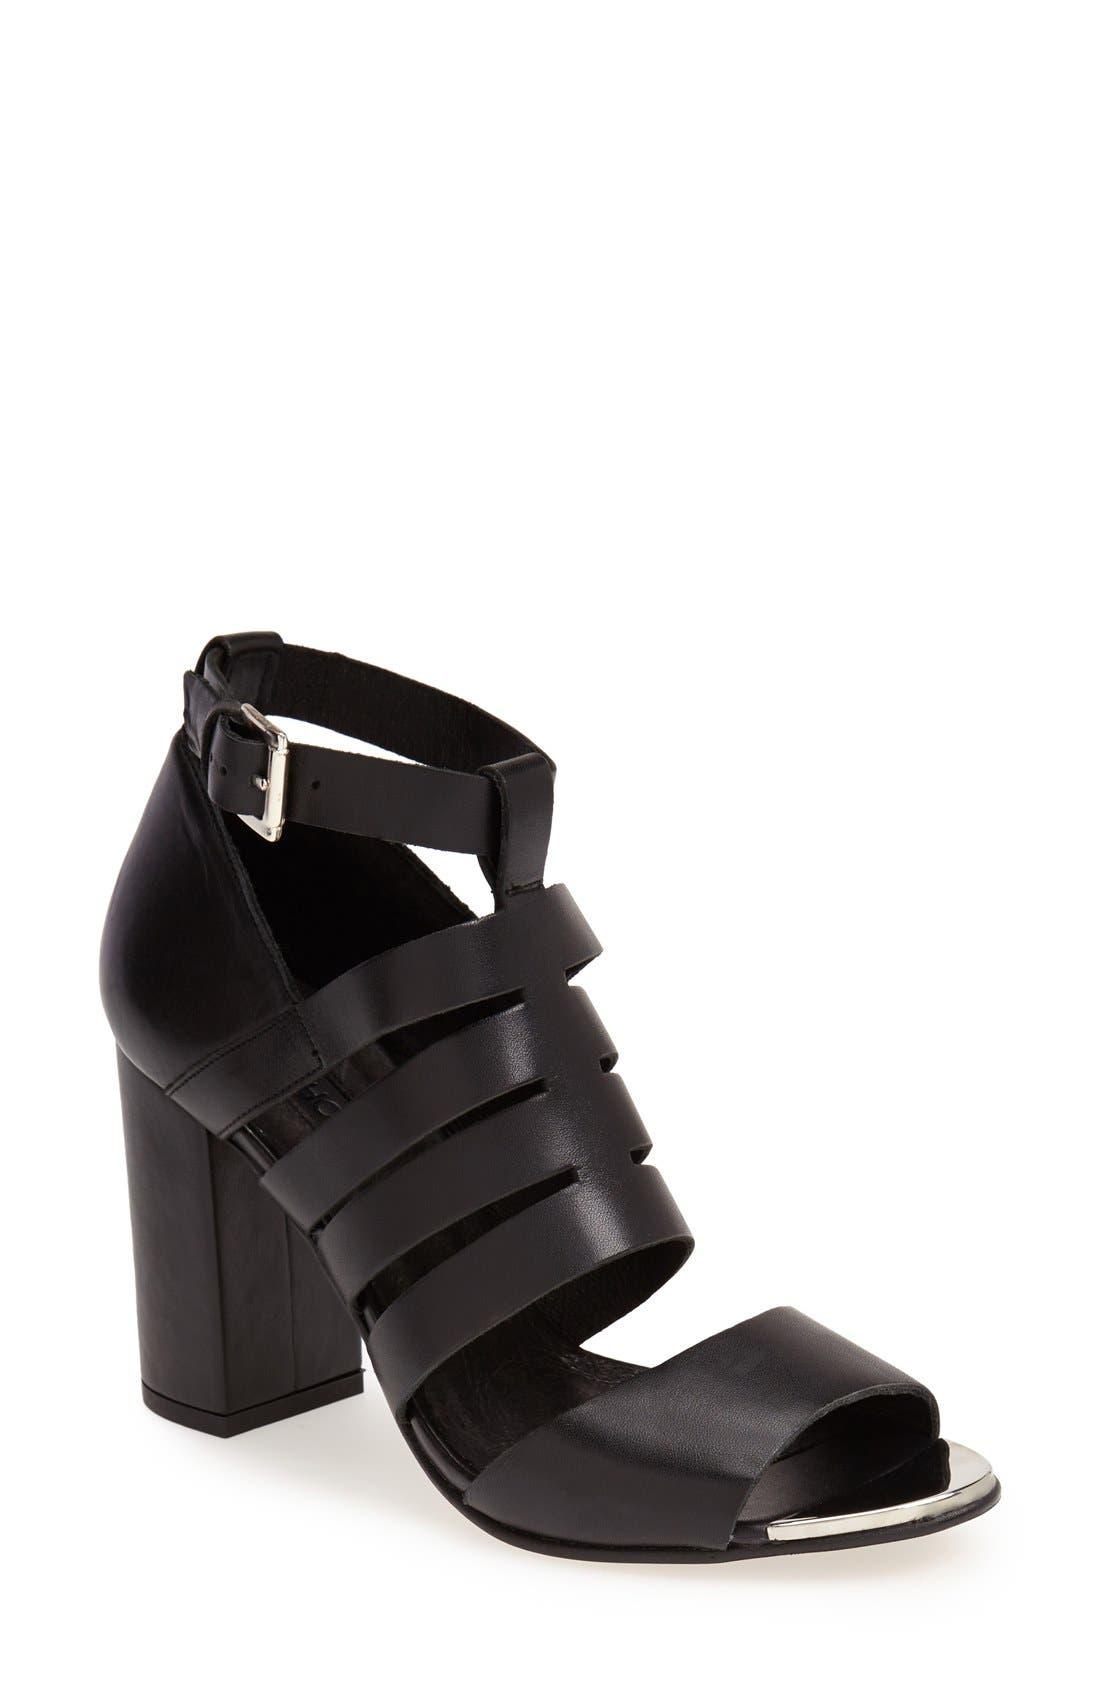 Alternate Image 1 Selected - Topshop 'Glare' Cutout Gladiator Sandal (Women)